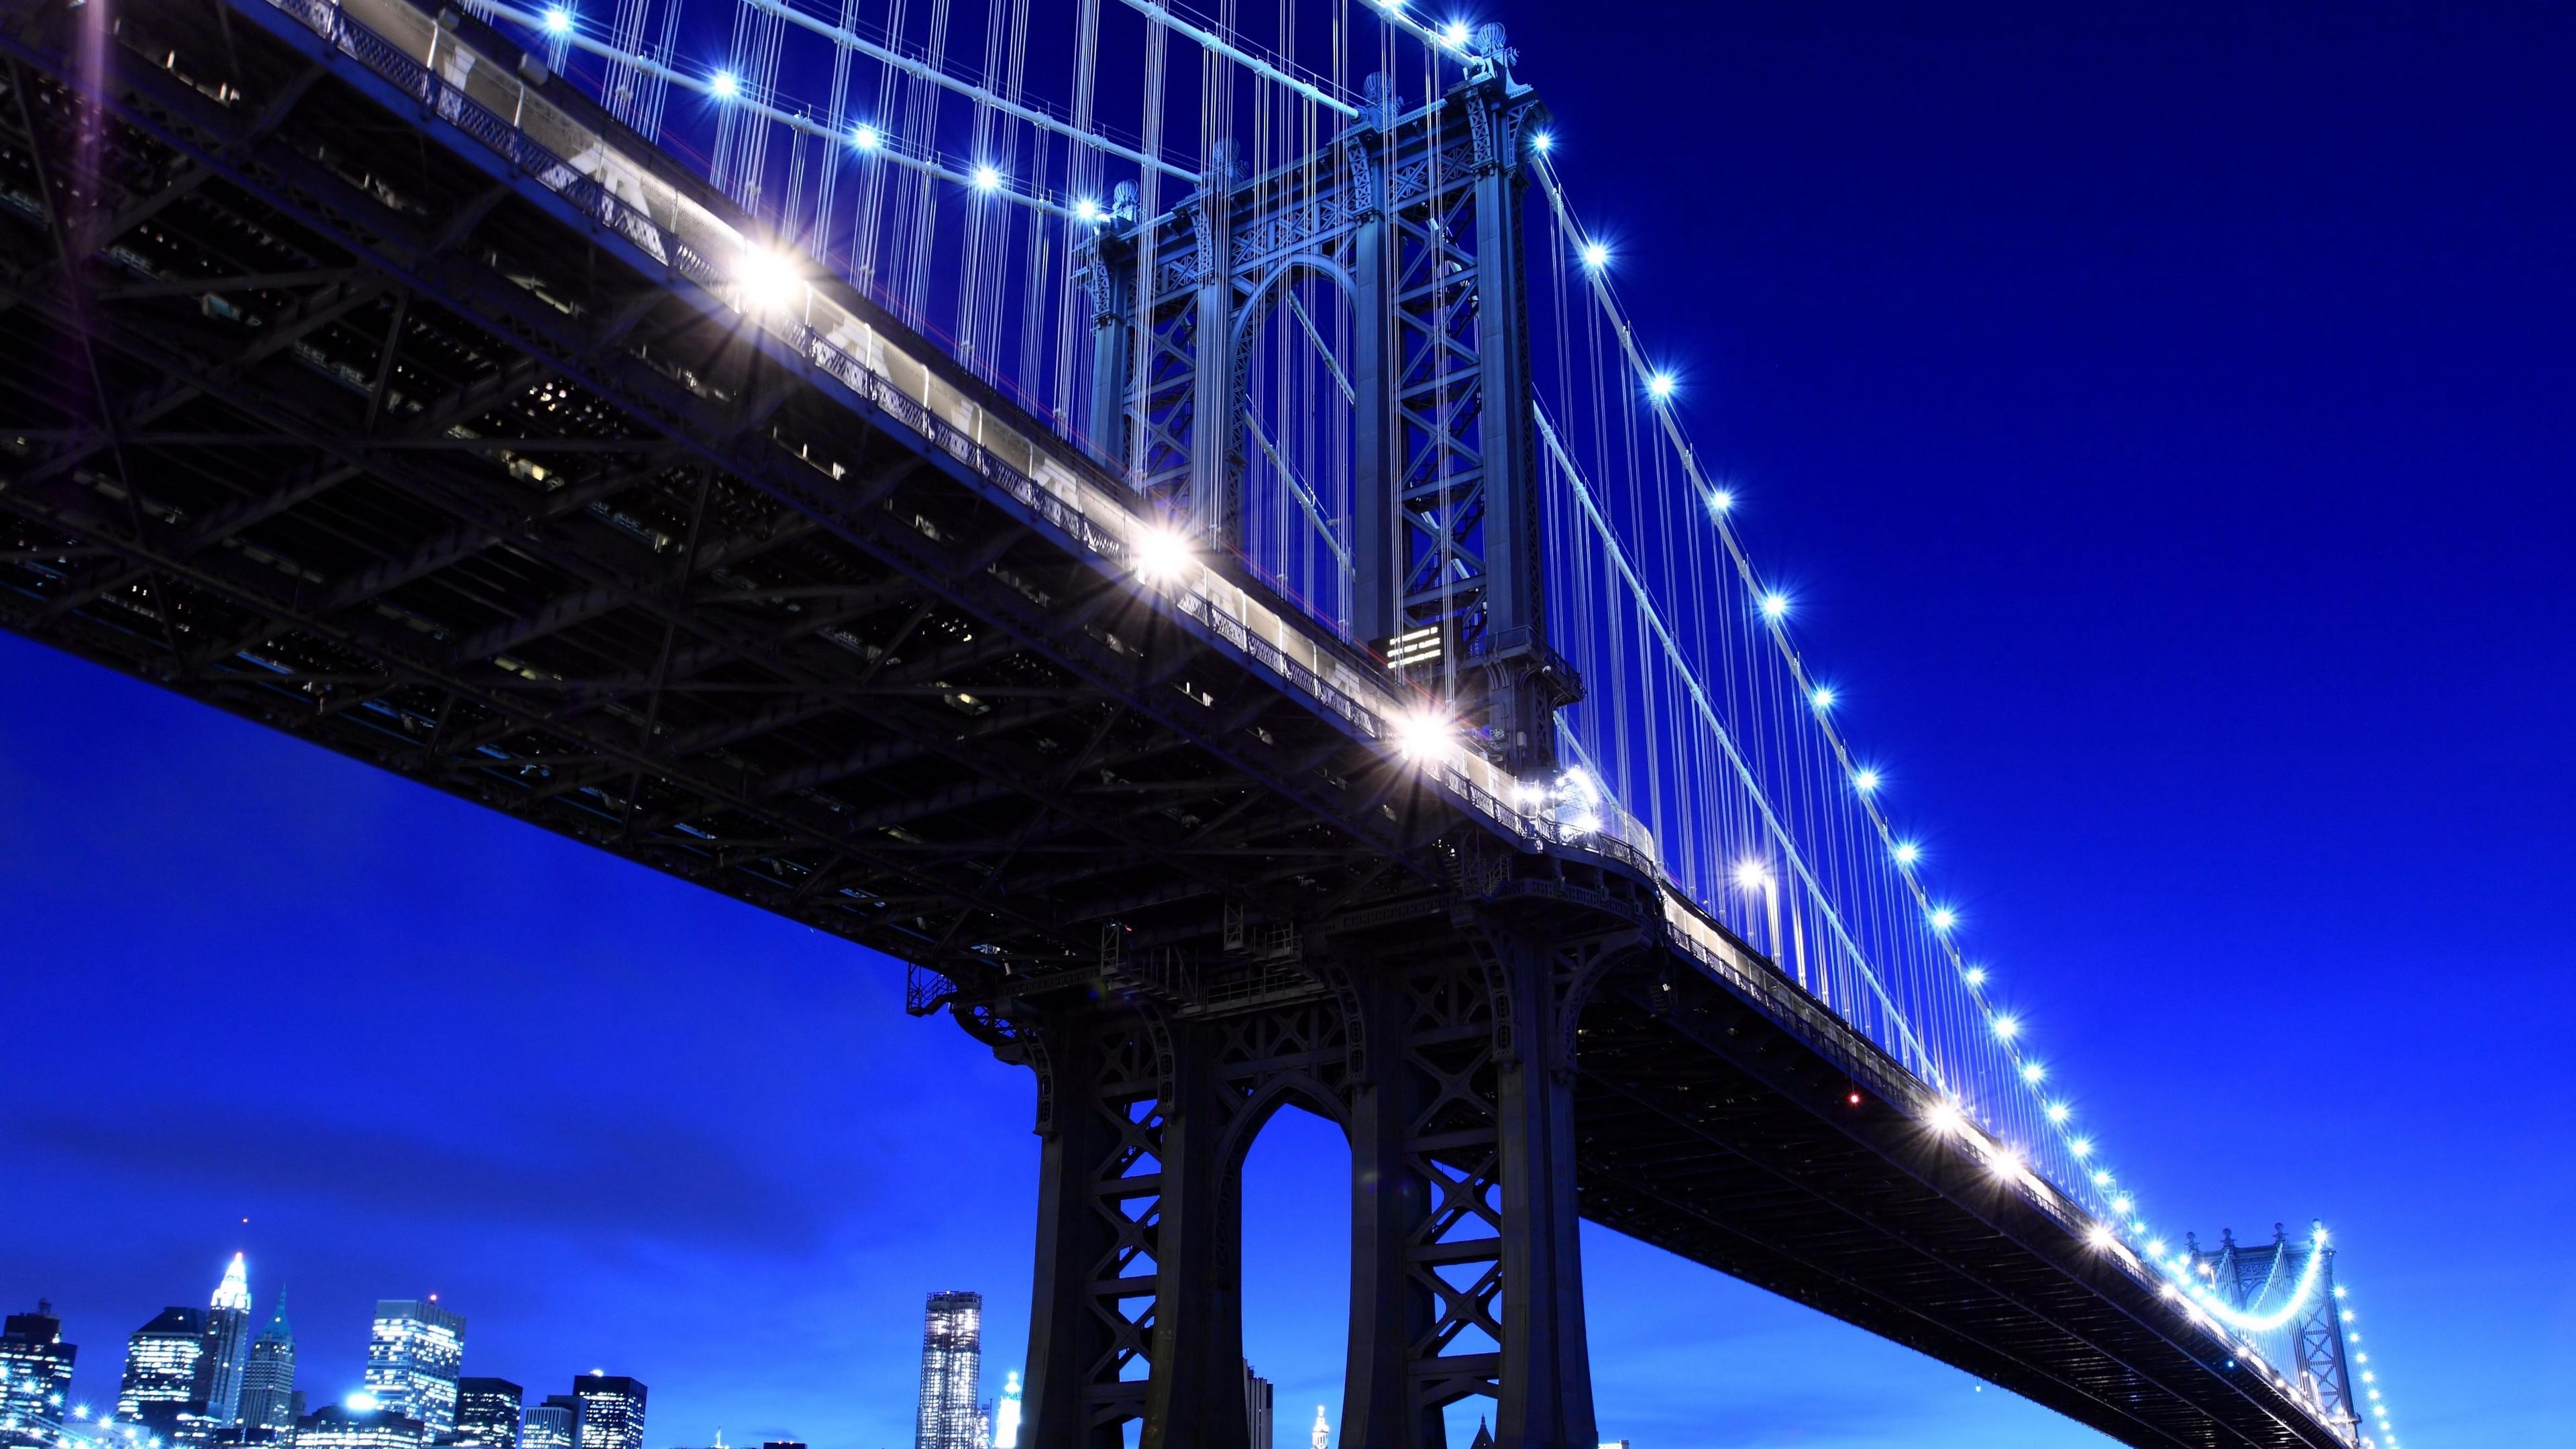 new york brooklyn bridge metropolis night usa 4k 1538065164 - new york, brooklyn bridge, metropolis, night, usa 4k - new york, metropolis, brooklyn bridge